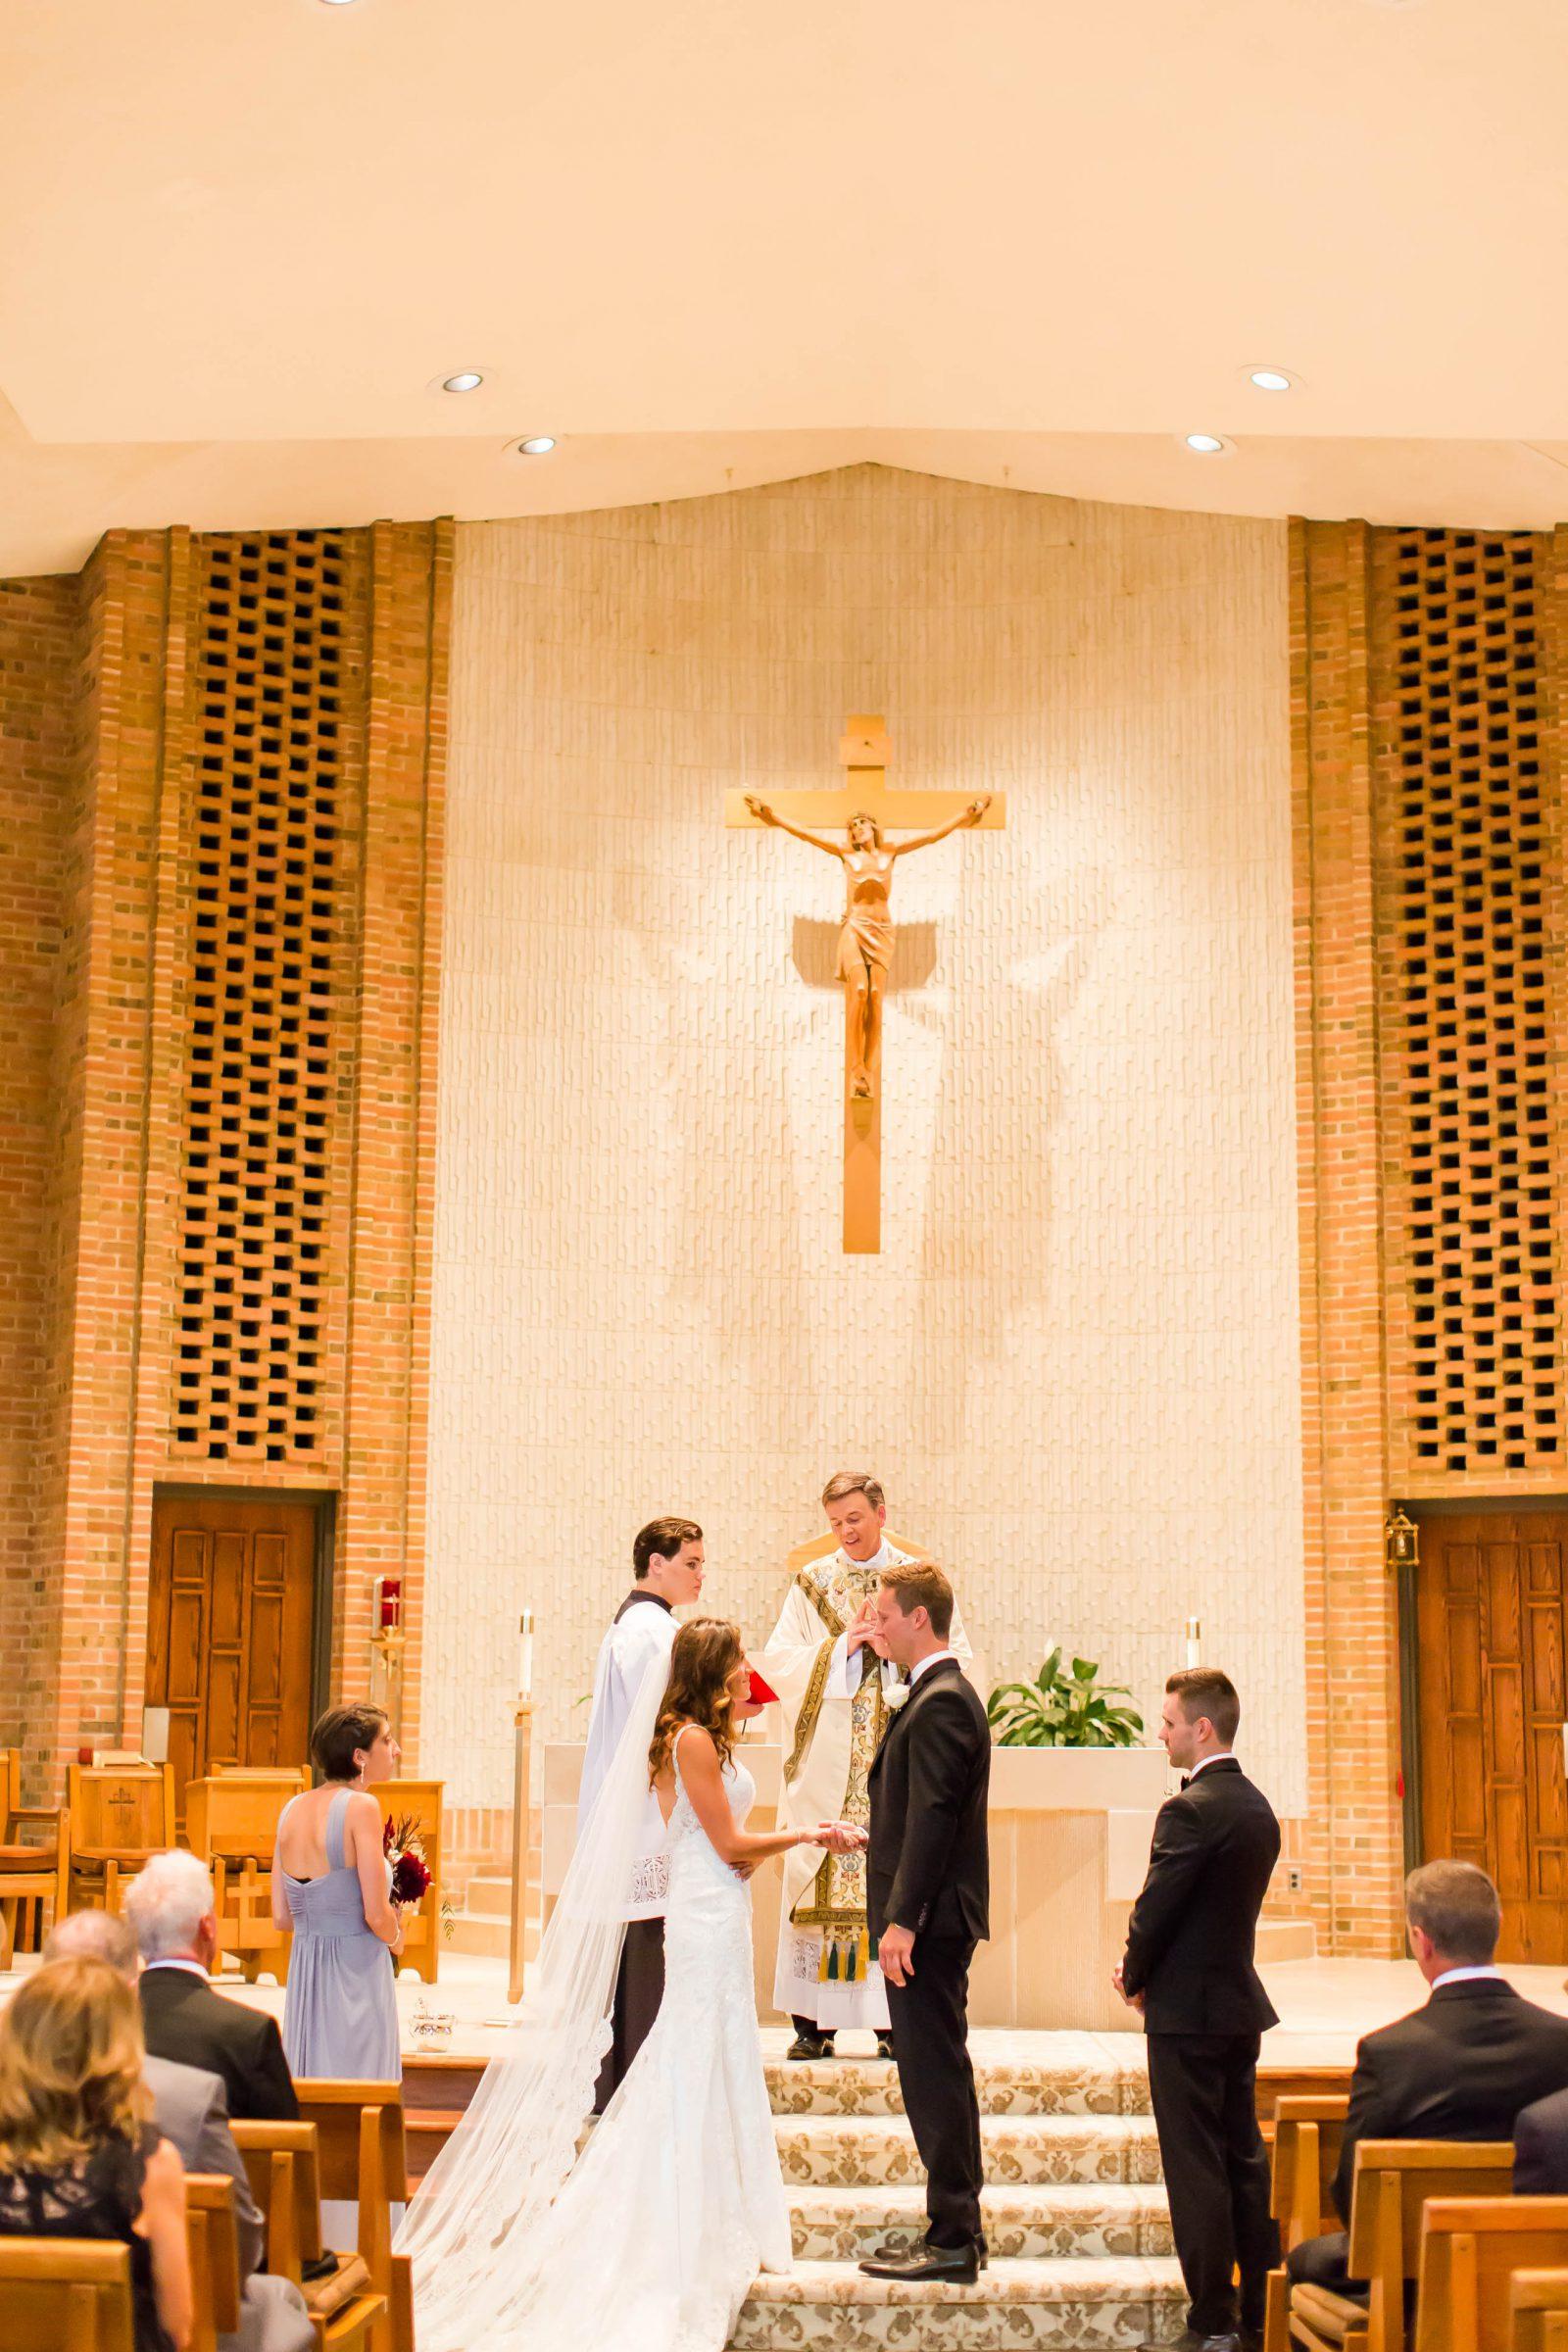 sunny-hill-wedding-venue-loren-jackson-photography-27